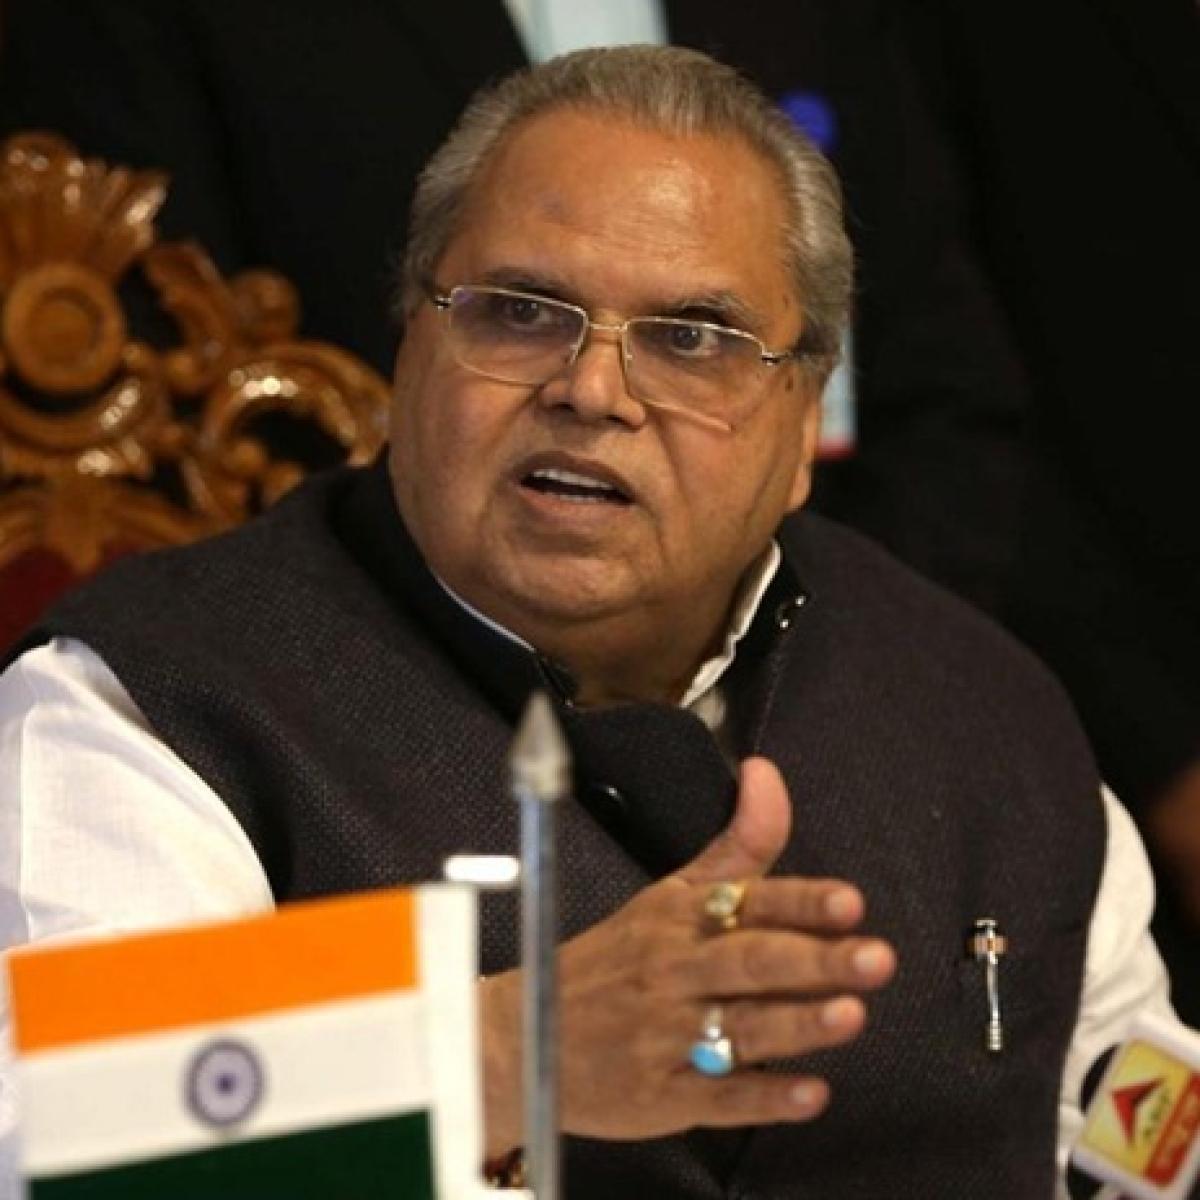 'Naam se hi satya hain': Twitter in splits after Goa Governor Satya Pal Malik says  'JK's Guv usually drinks wine, plays golf'